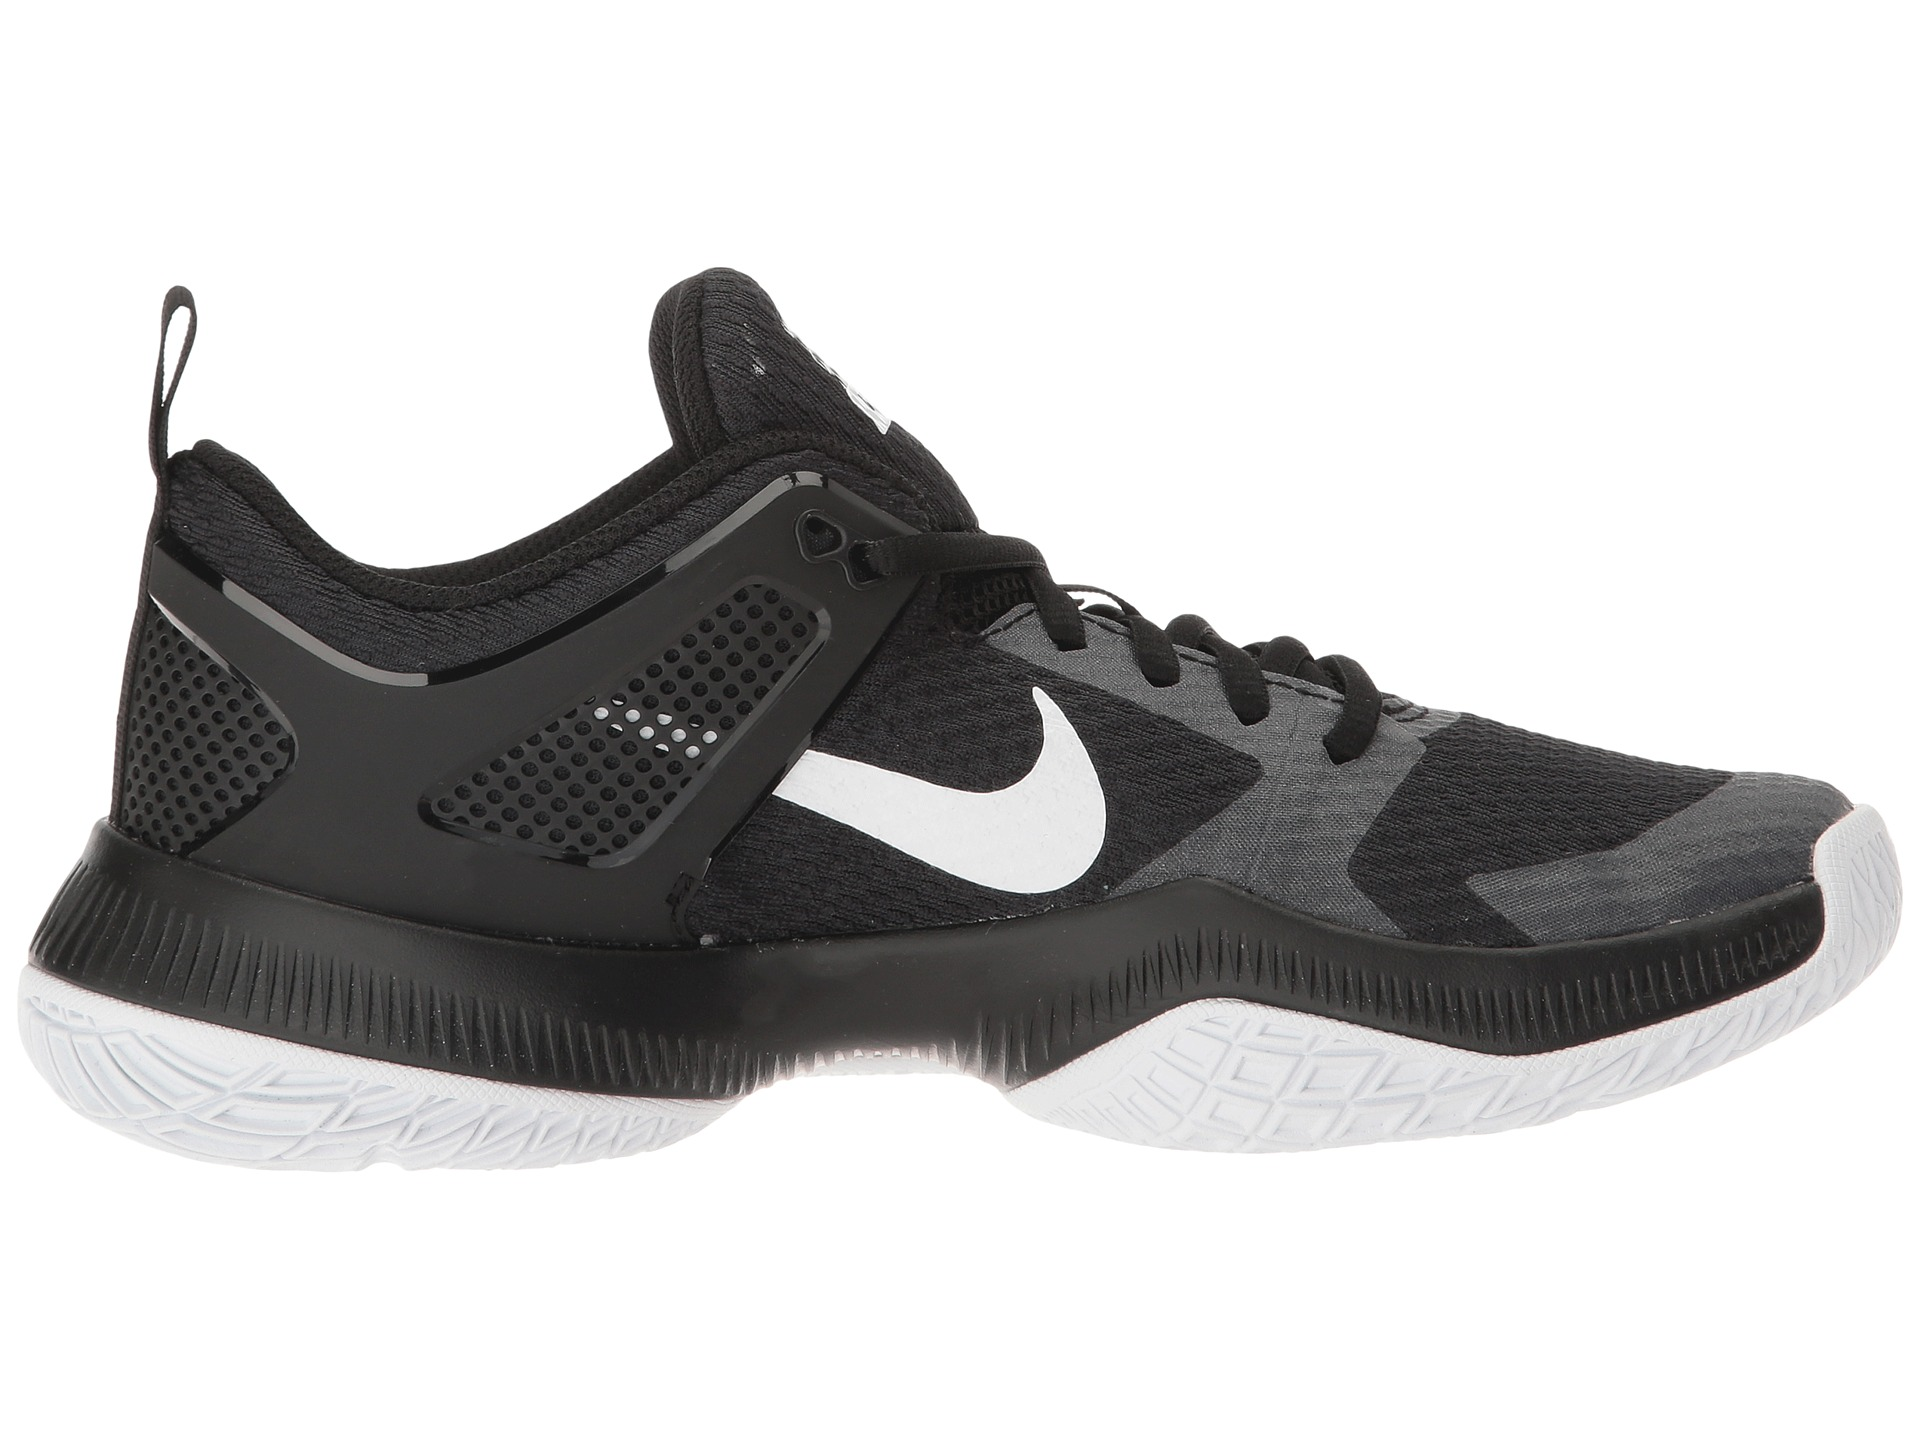 Nike Shoes Zappos Sale